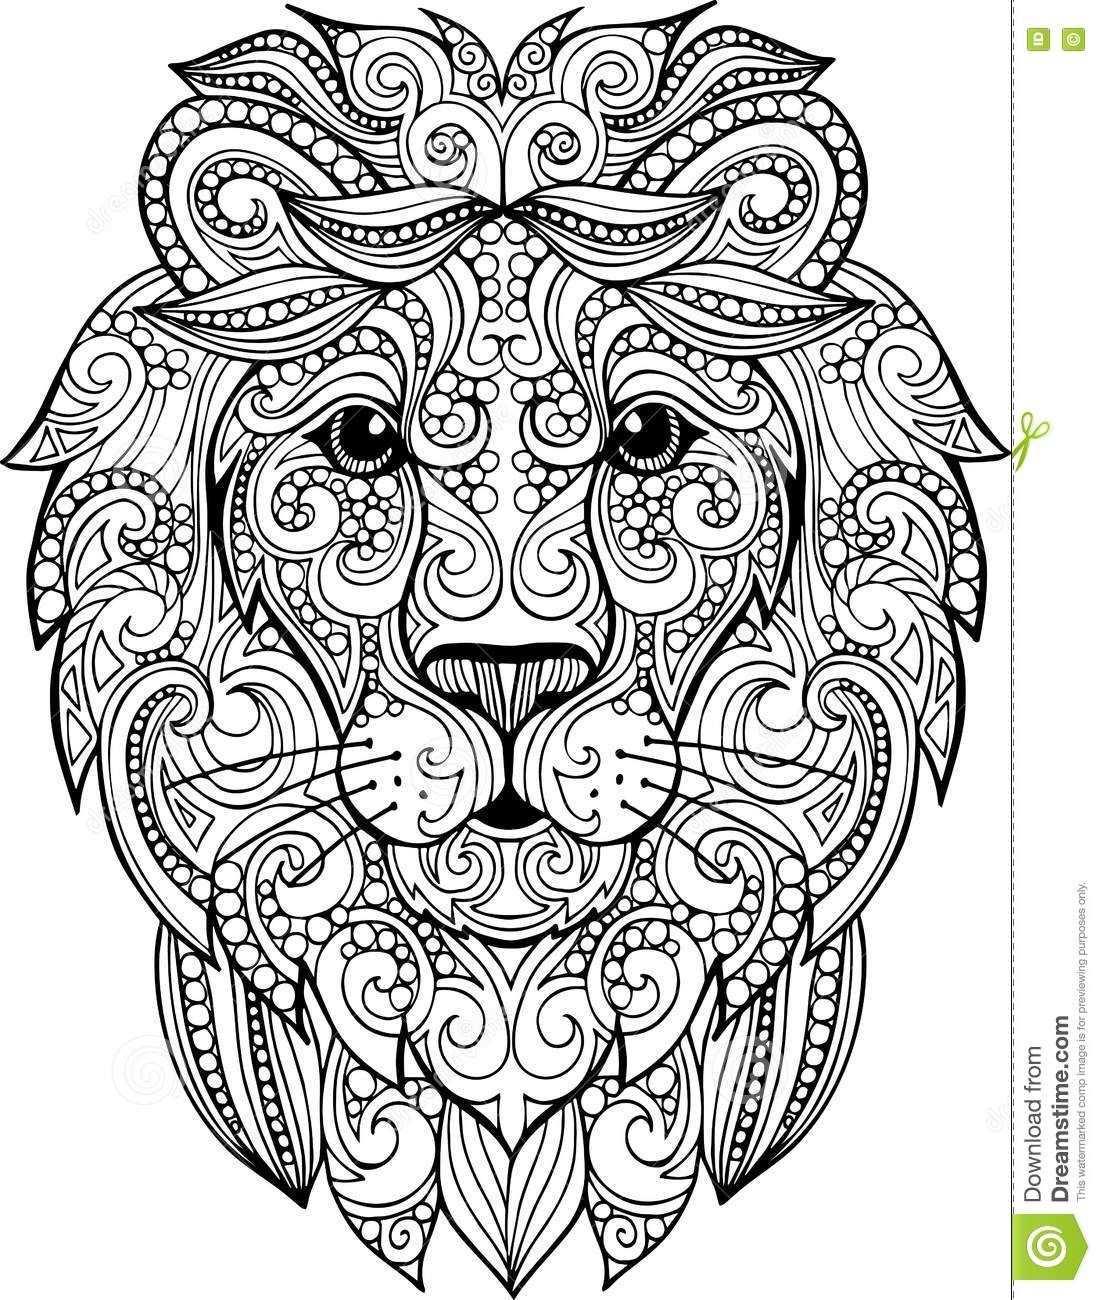 kleurplaat mandala leeuw